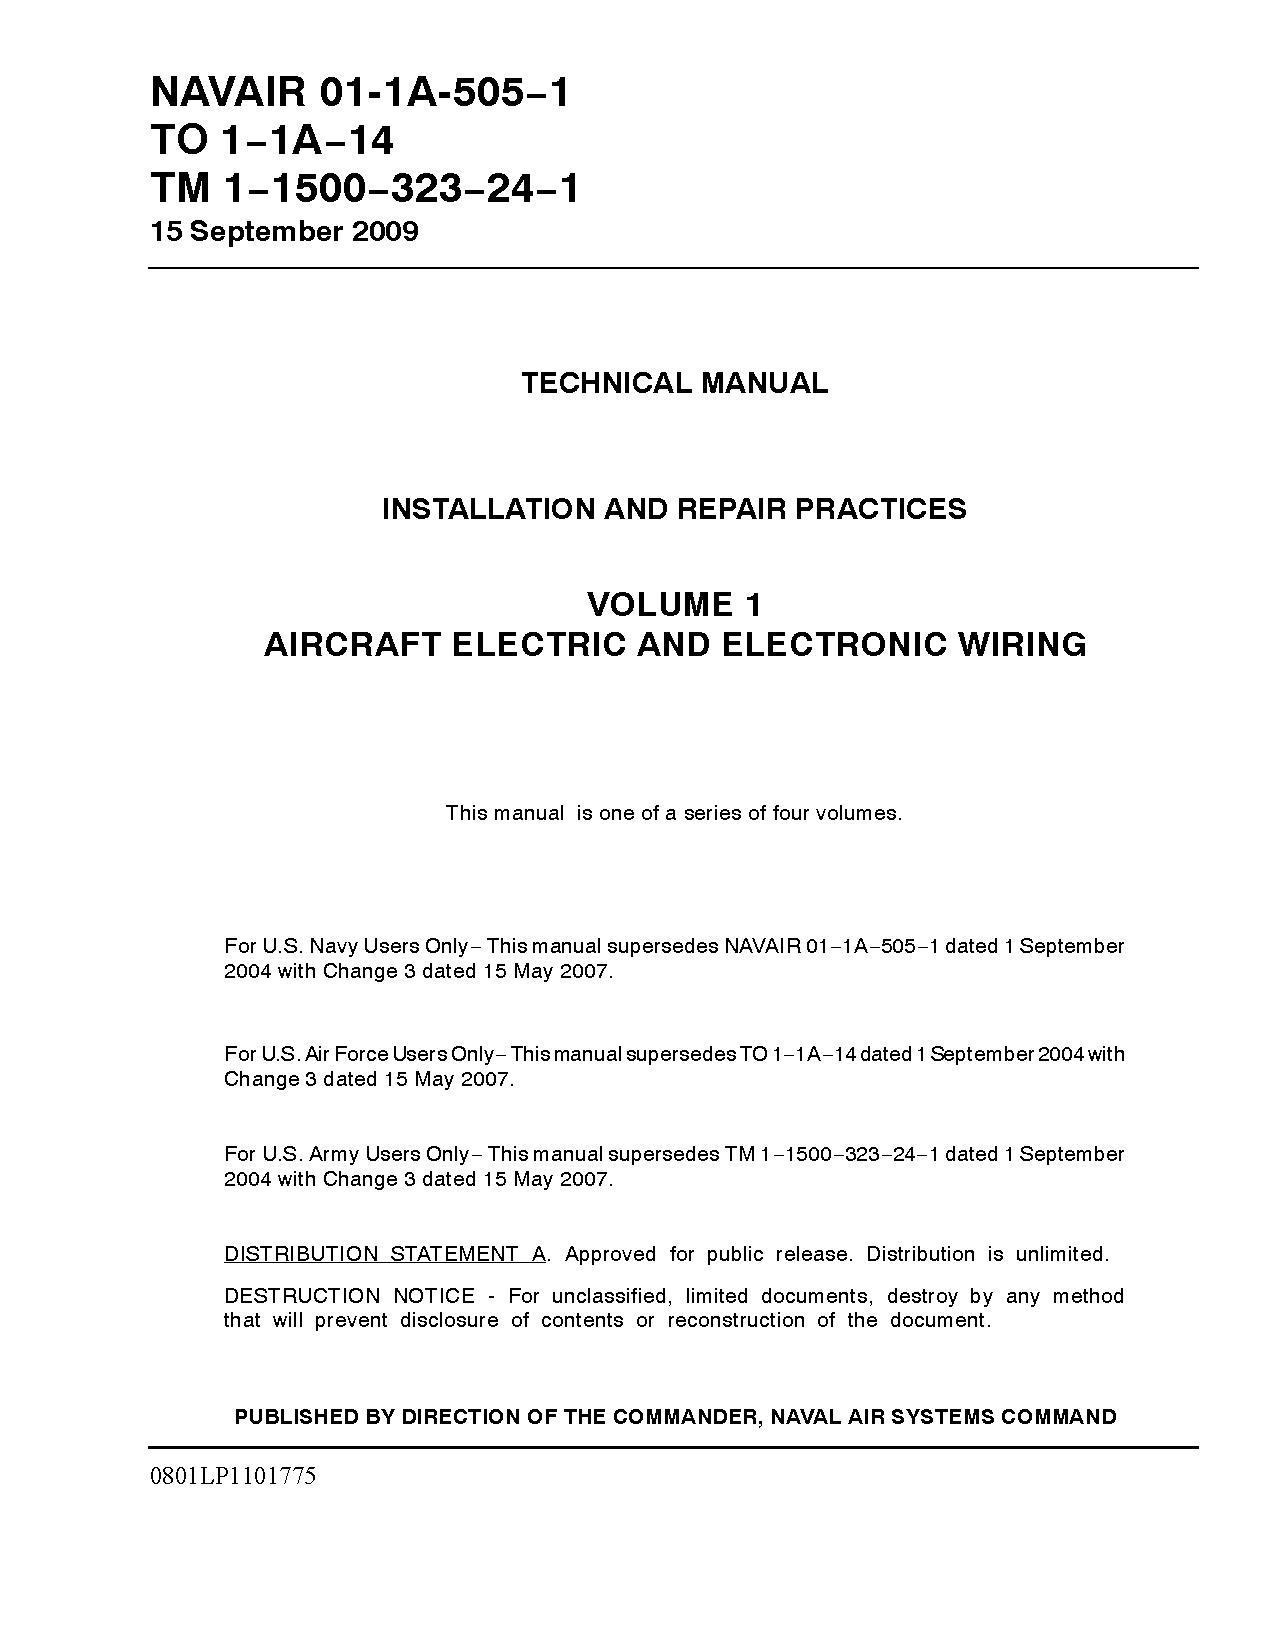 file tm 1 1500 323 24 1 pdf wikimedia commons rh commons wikimedia org NAVAIR Scott Williams Navy Technical Manual